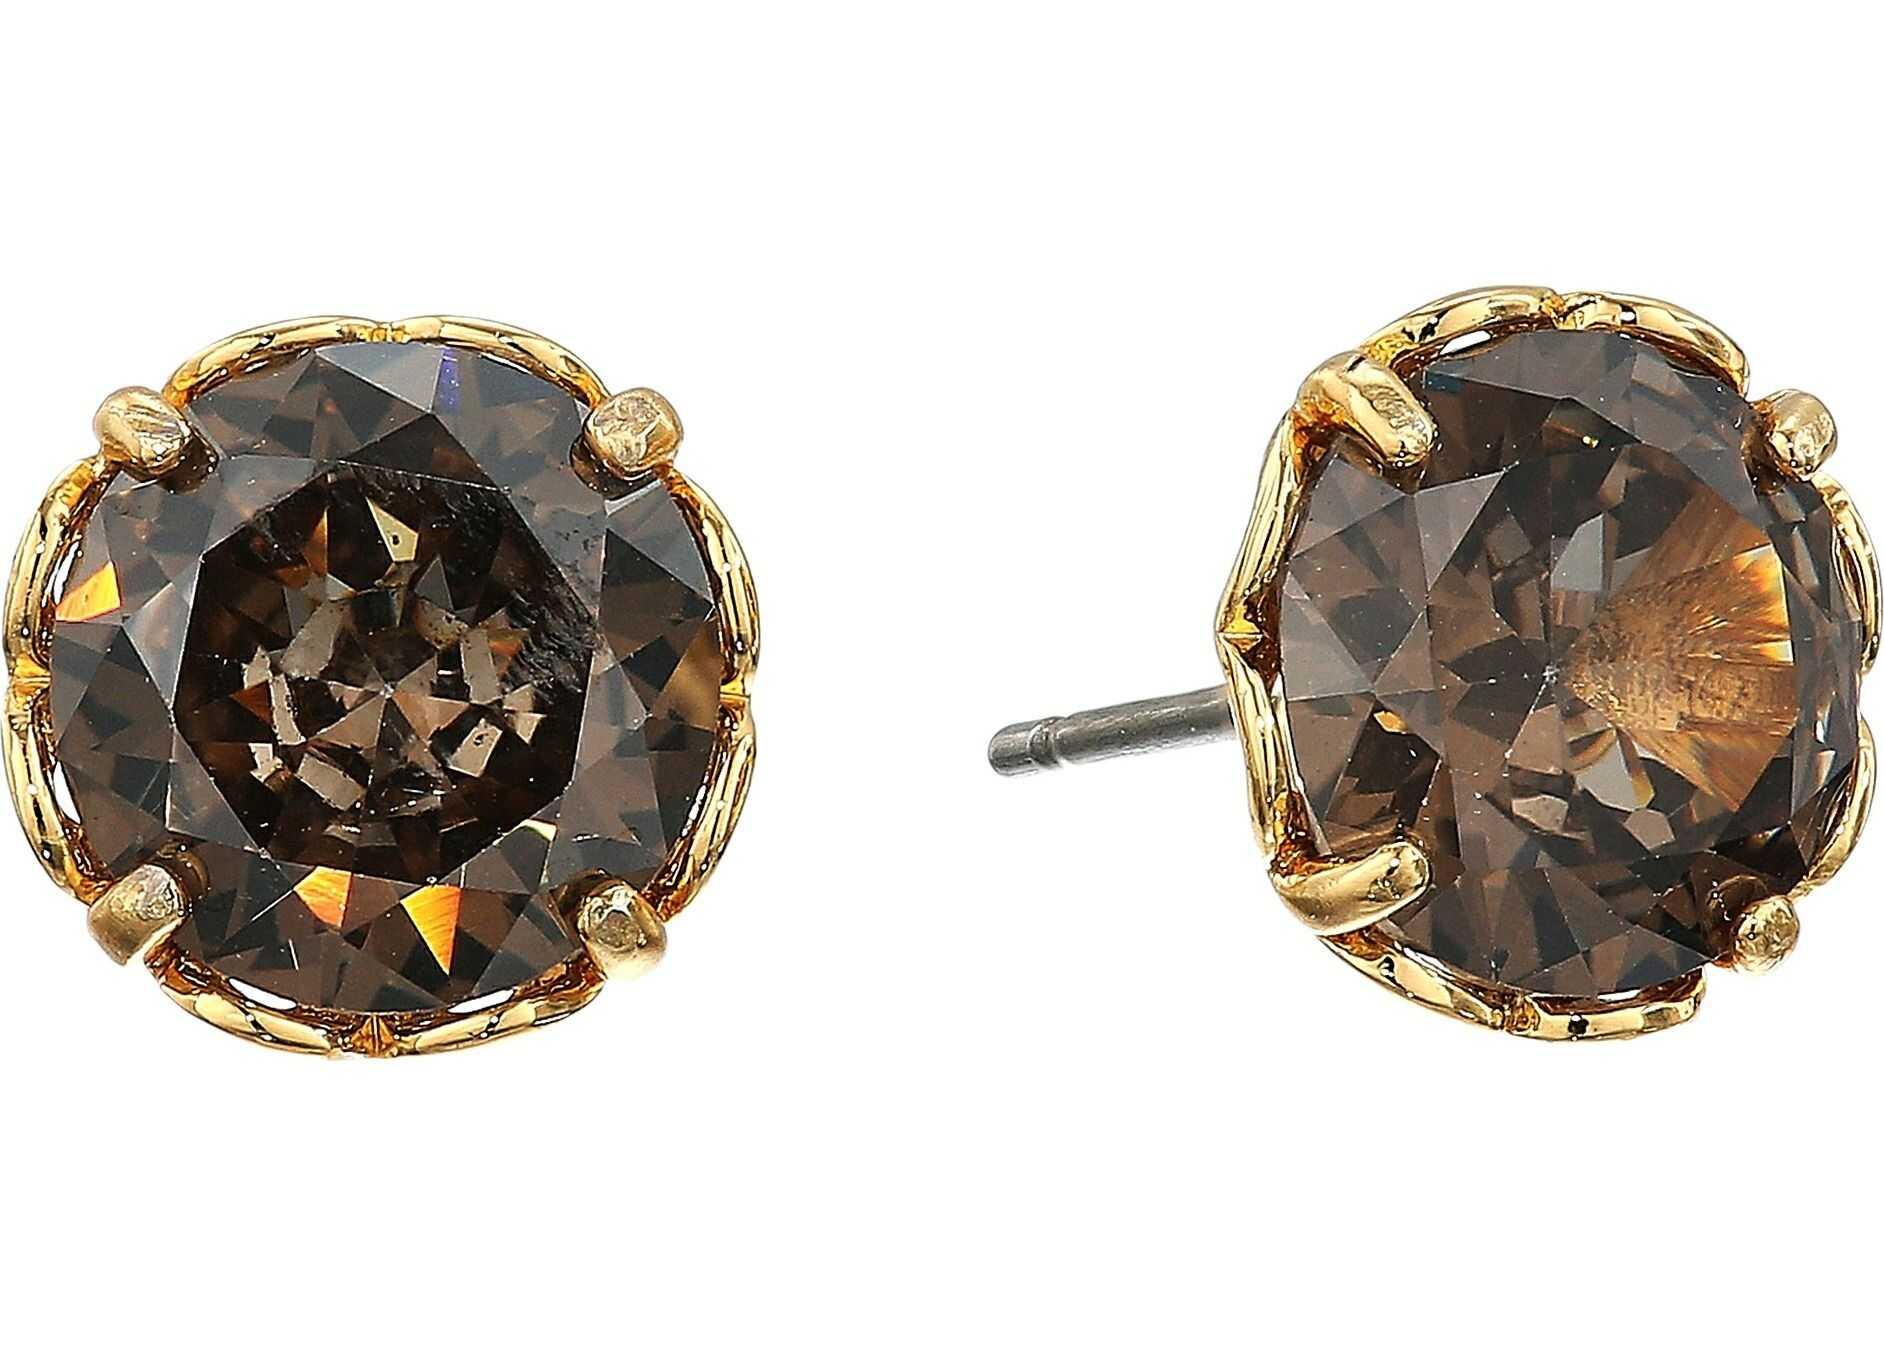 Kate Spade New York That Sparkle Round Earrings Black Diamond